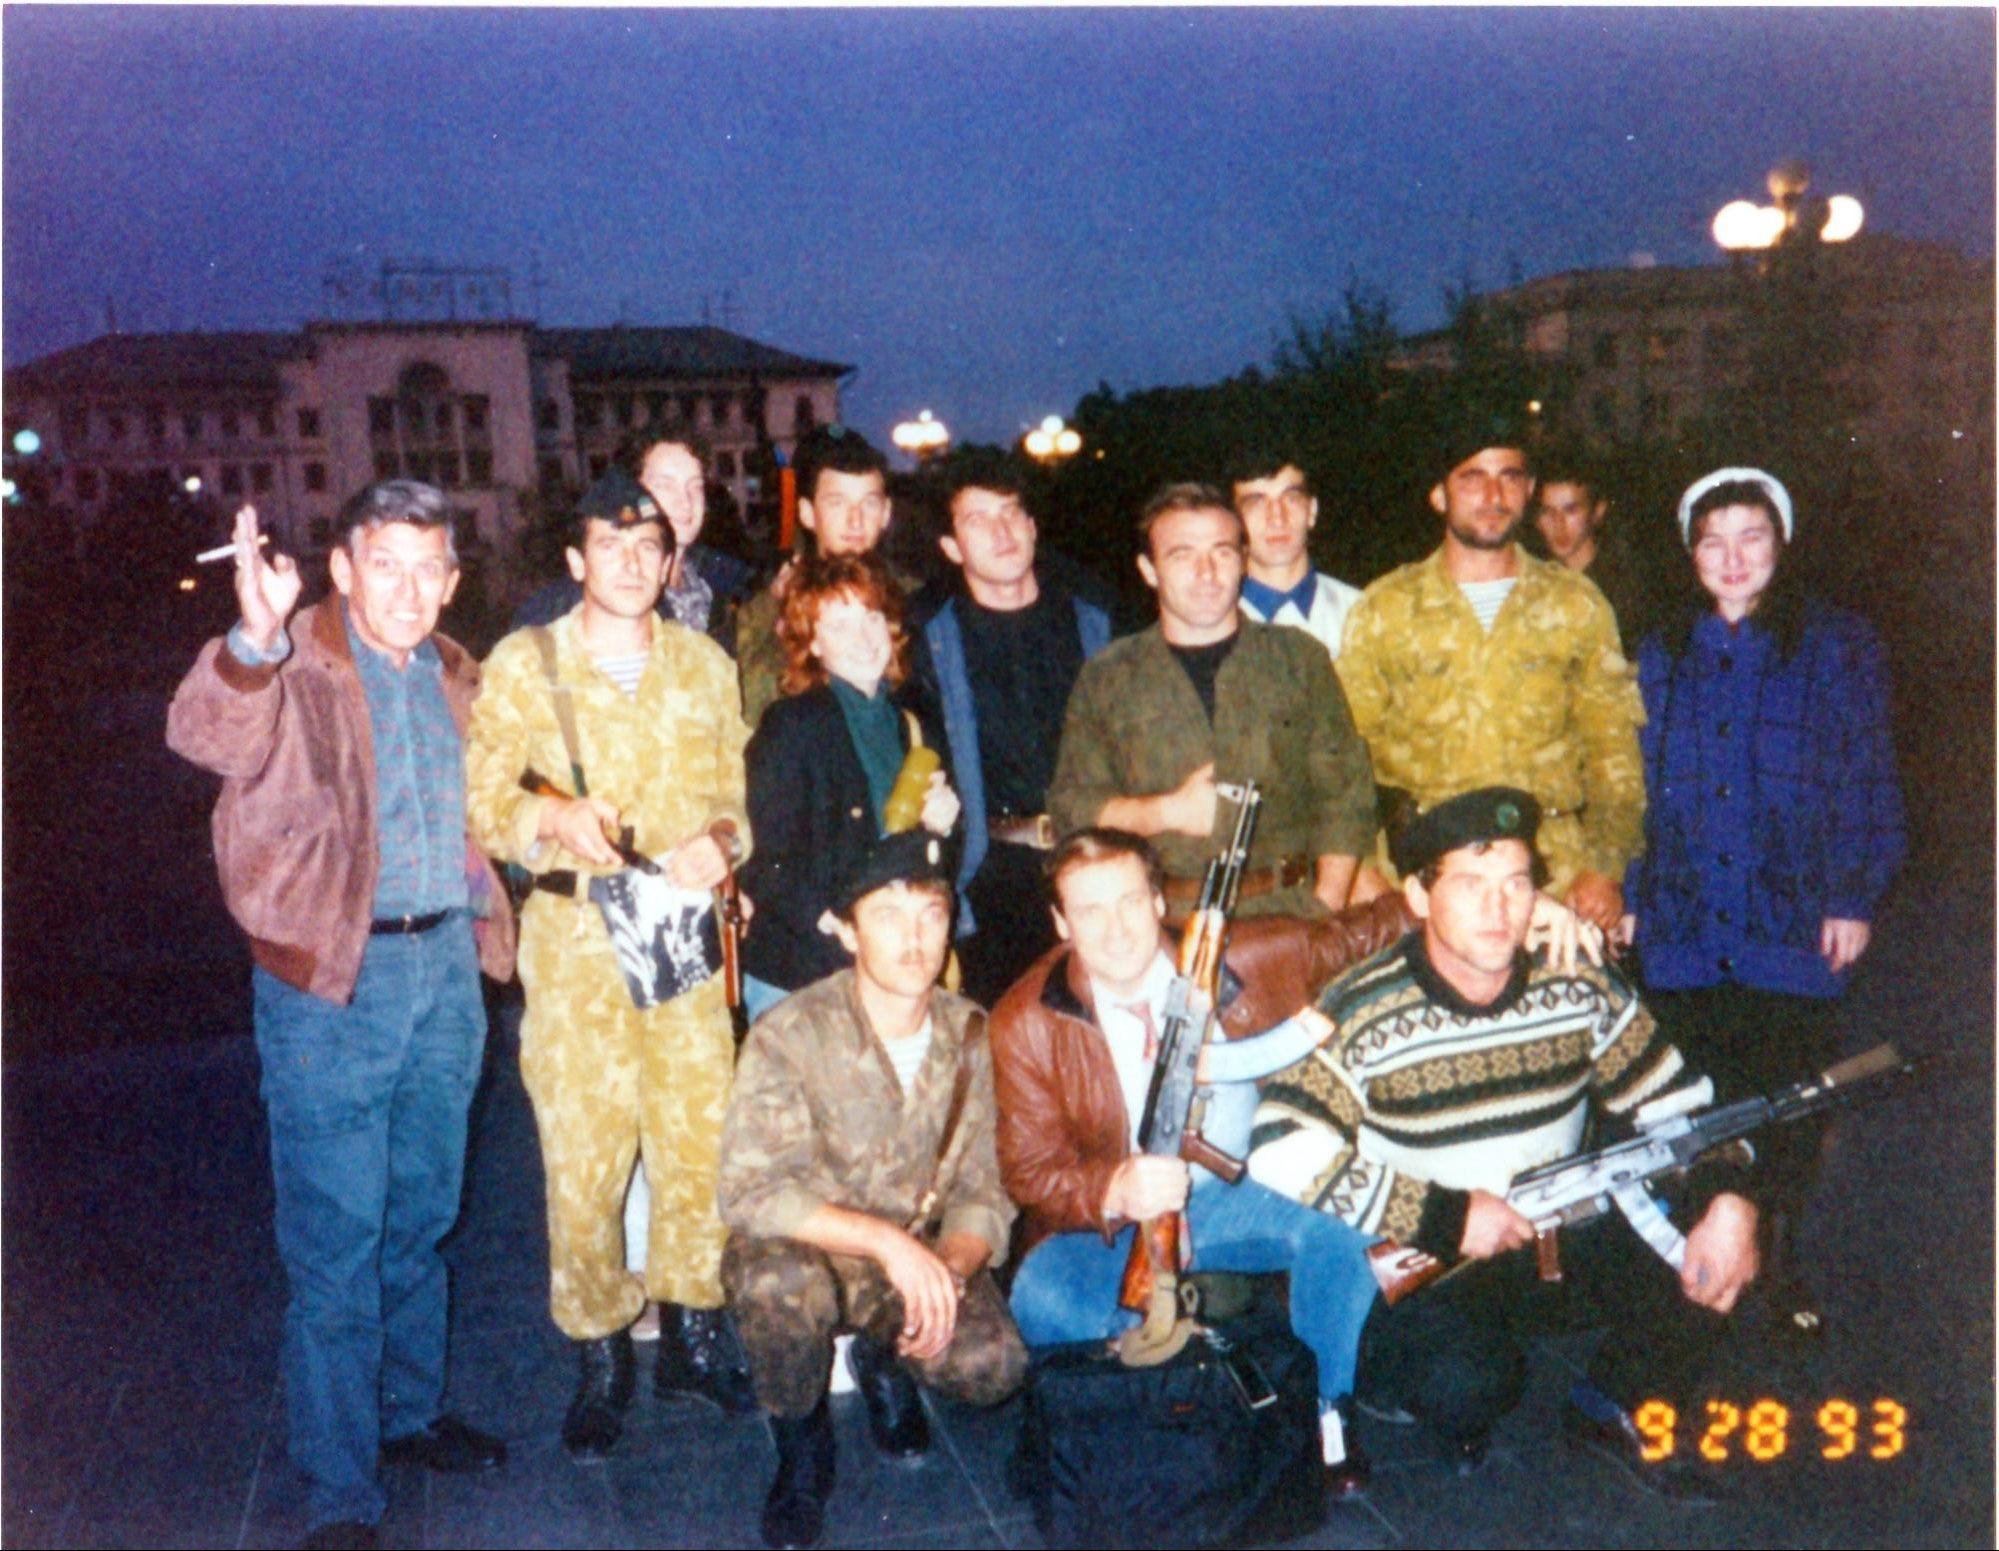 Gorilla Fighters in Grosny - Chechnya